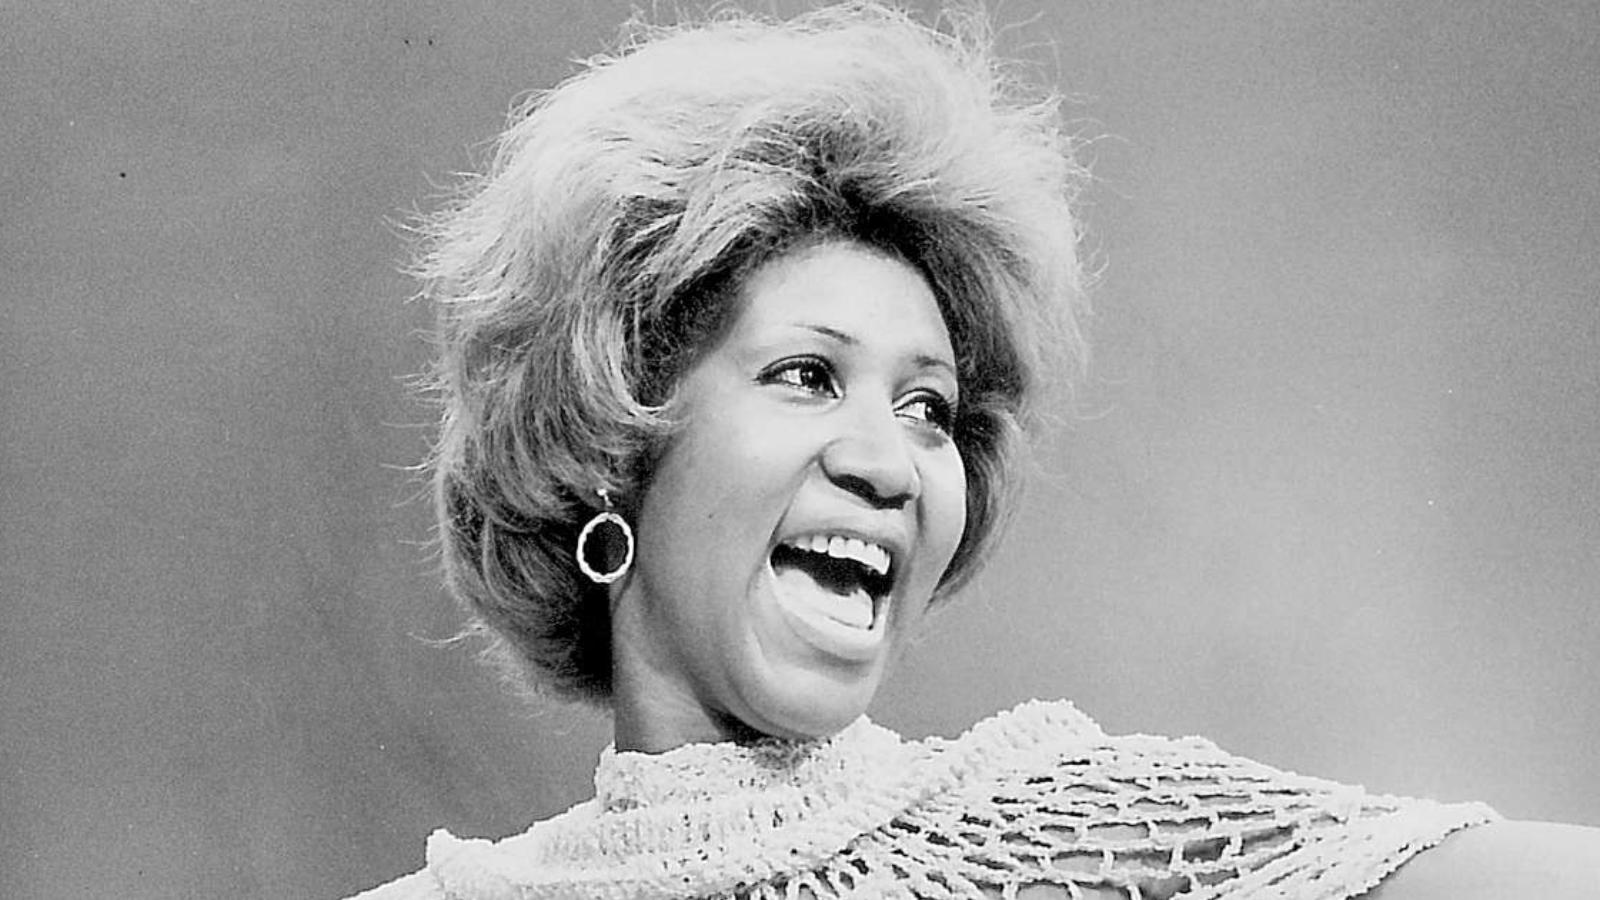 Aretha Franklin Image: San Francisco Chronicle